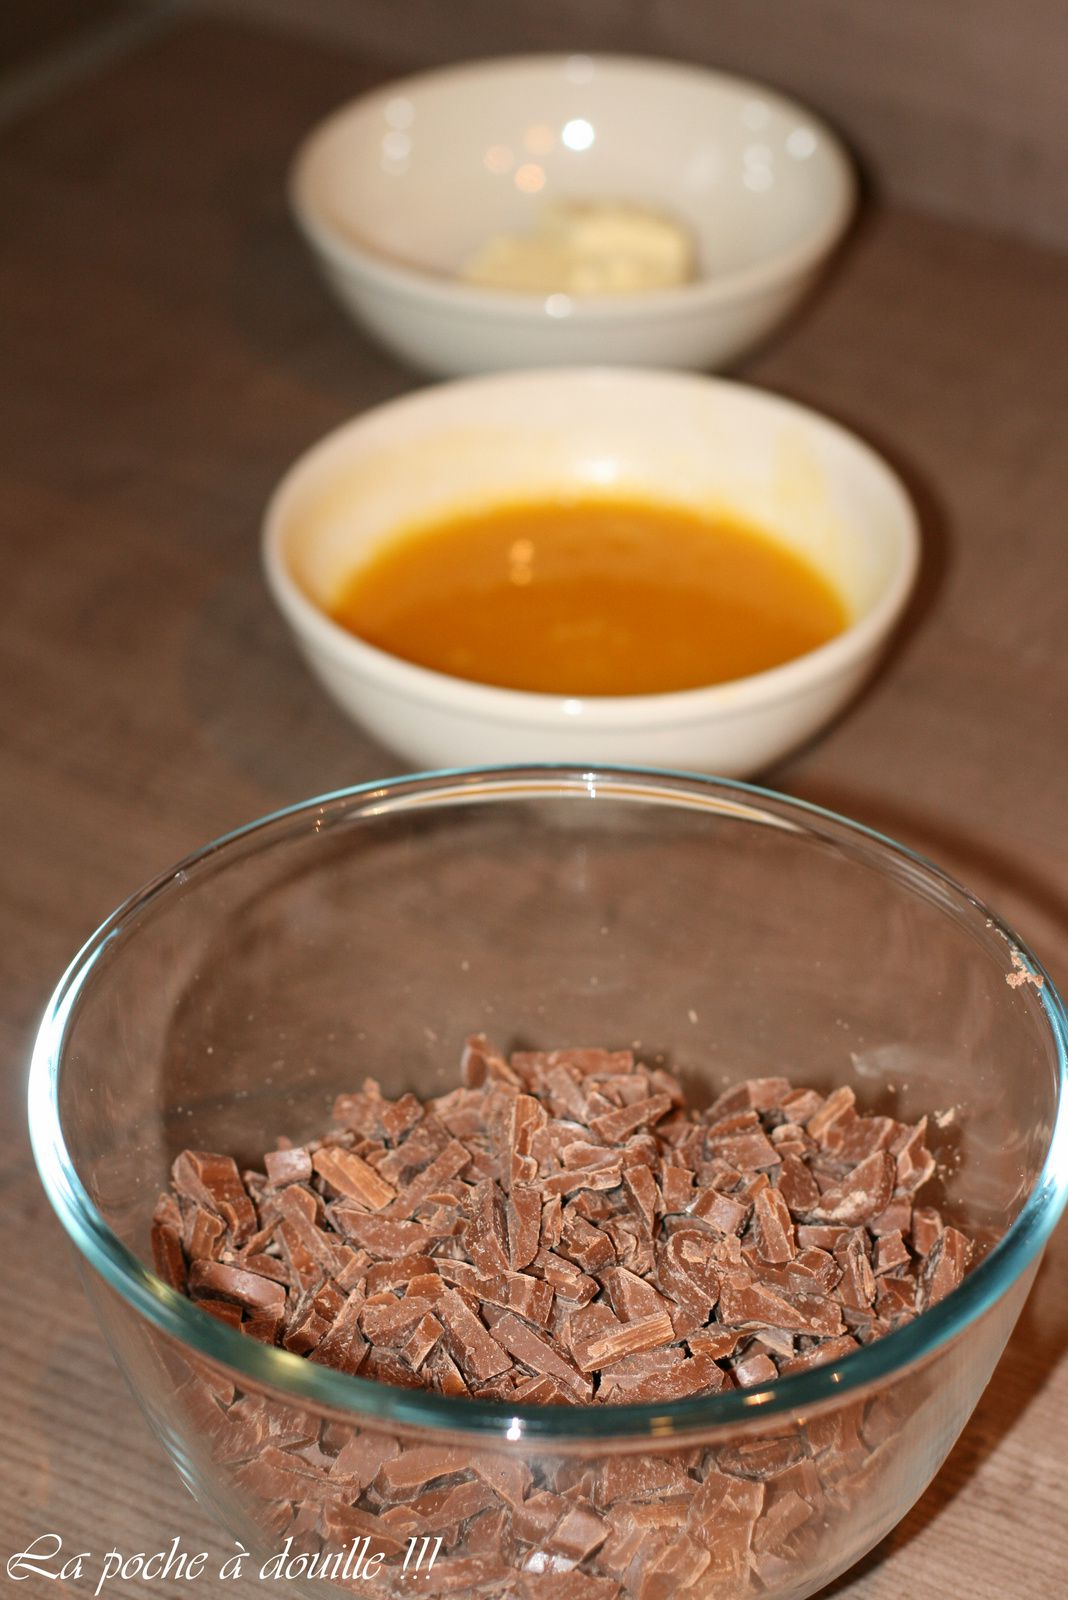 Macaron Chocolat Mangue Passion